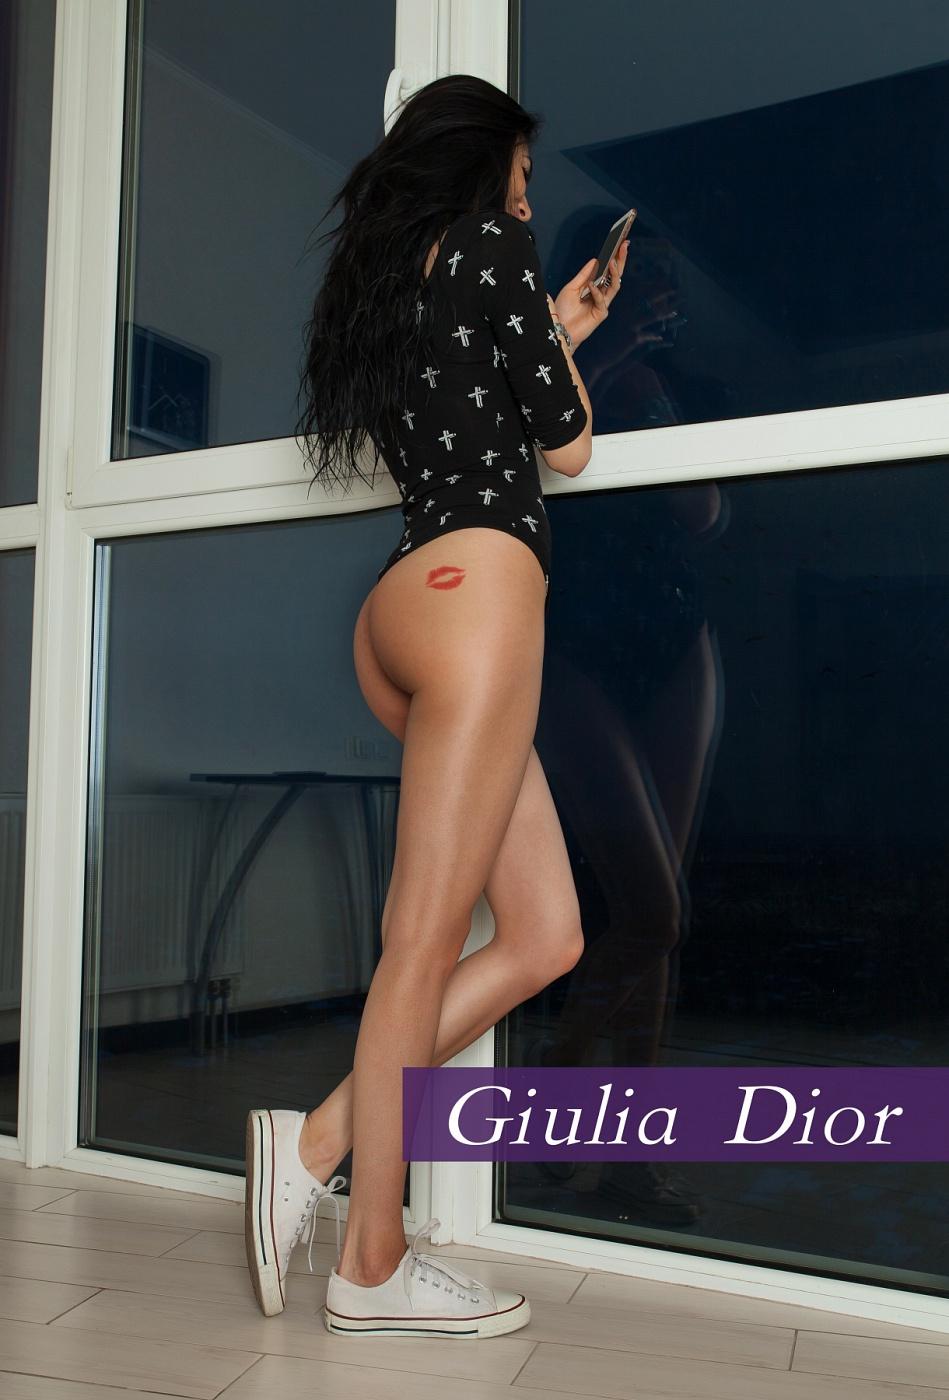 Giulia Dior